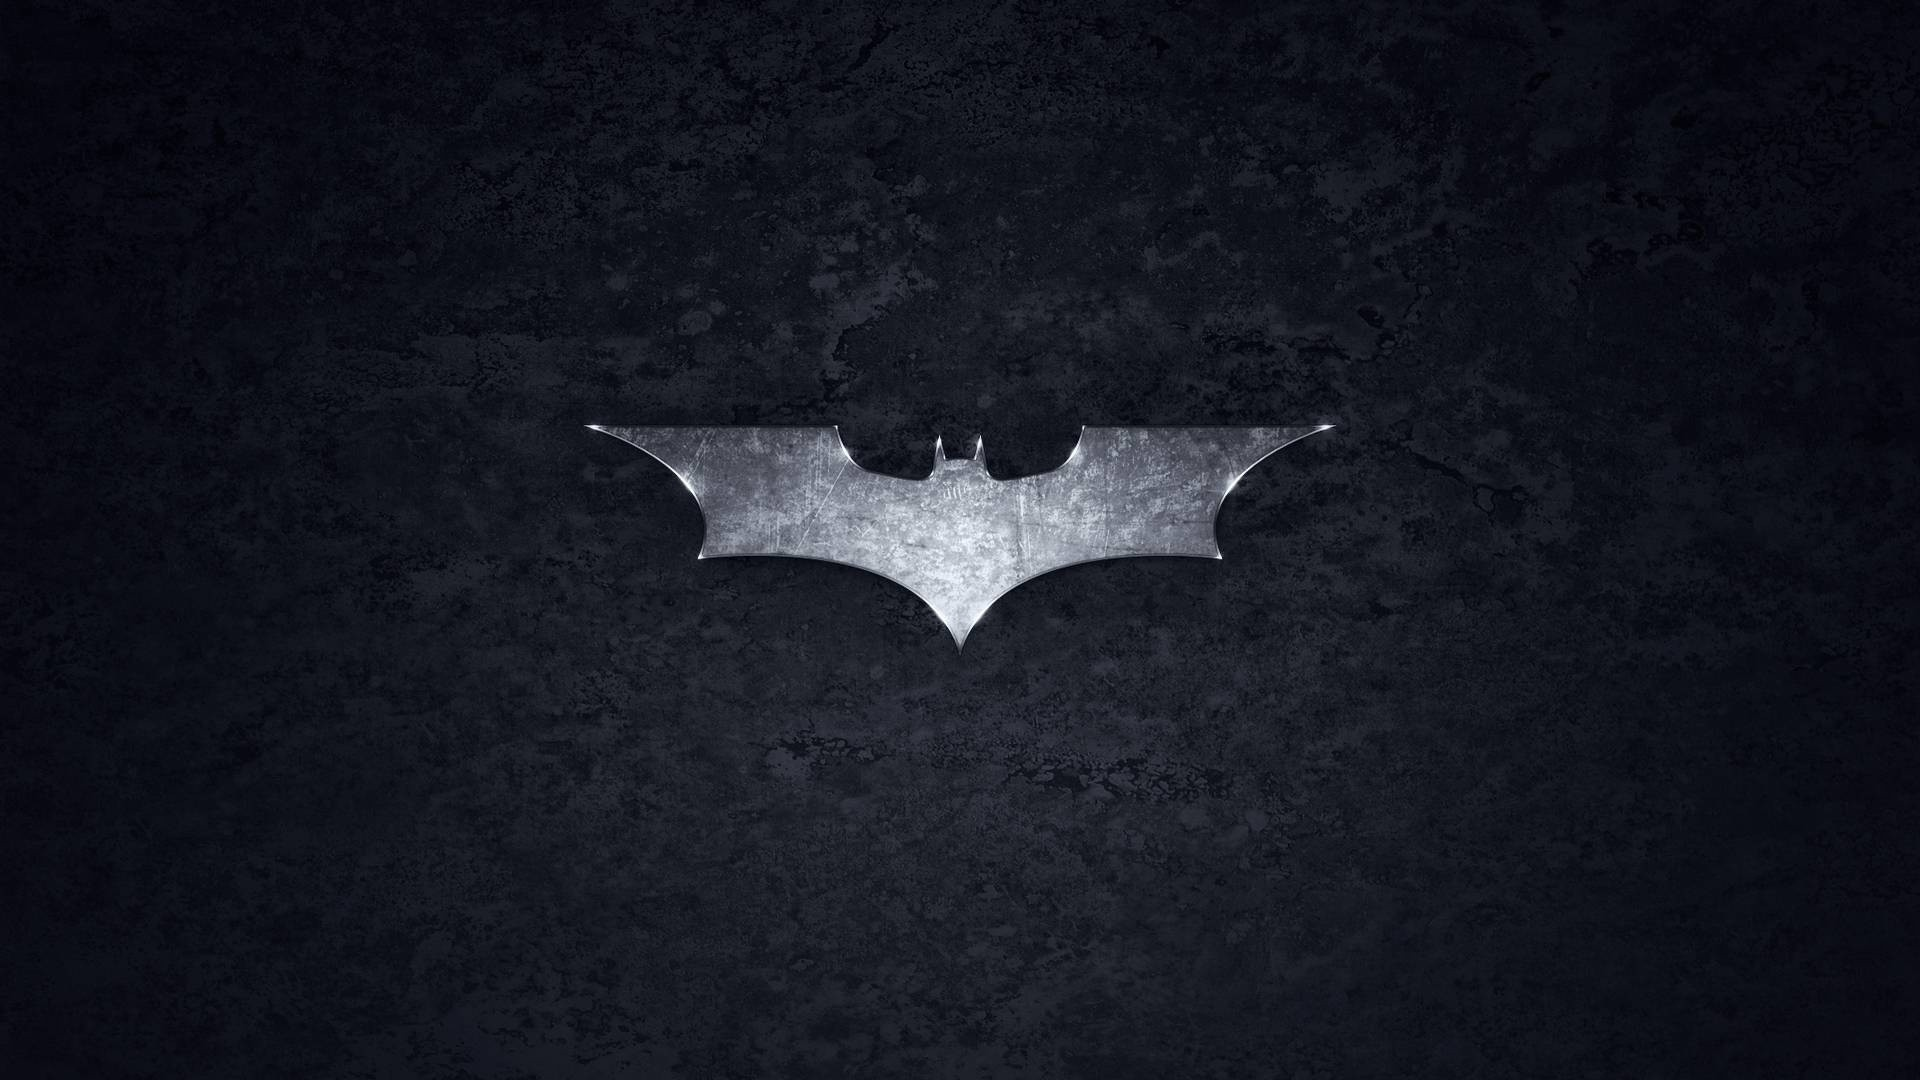 15 Batman The Dark Knight Rises Wallpapers   DezineGuide 1920x1080